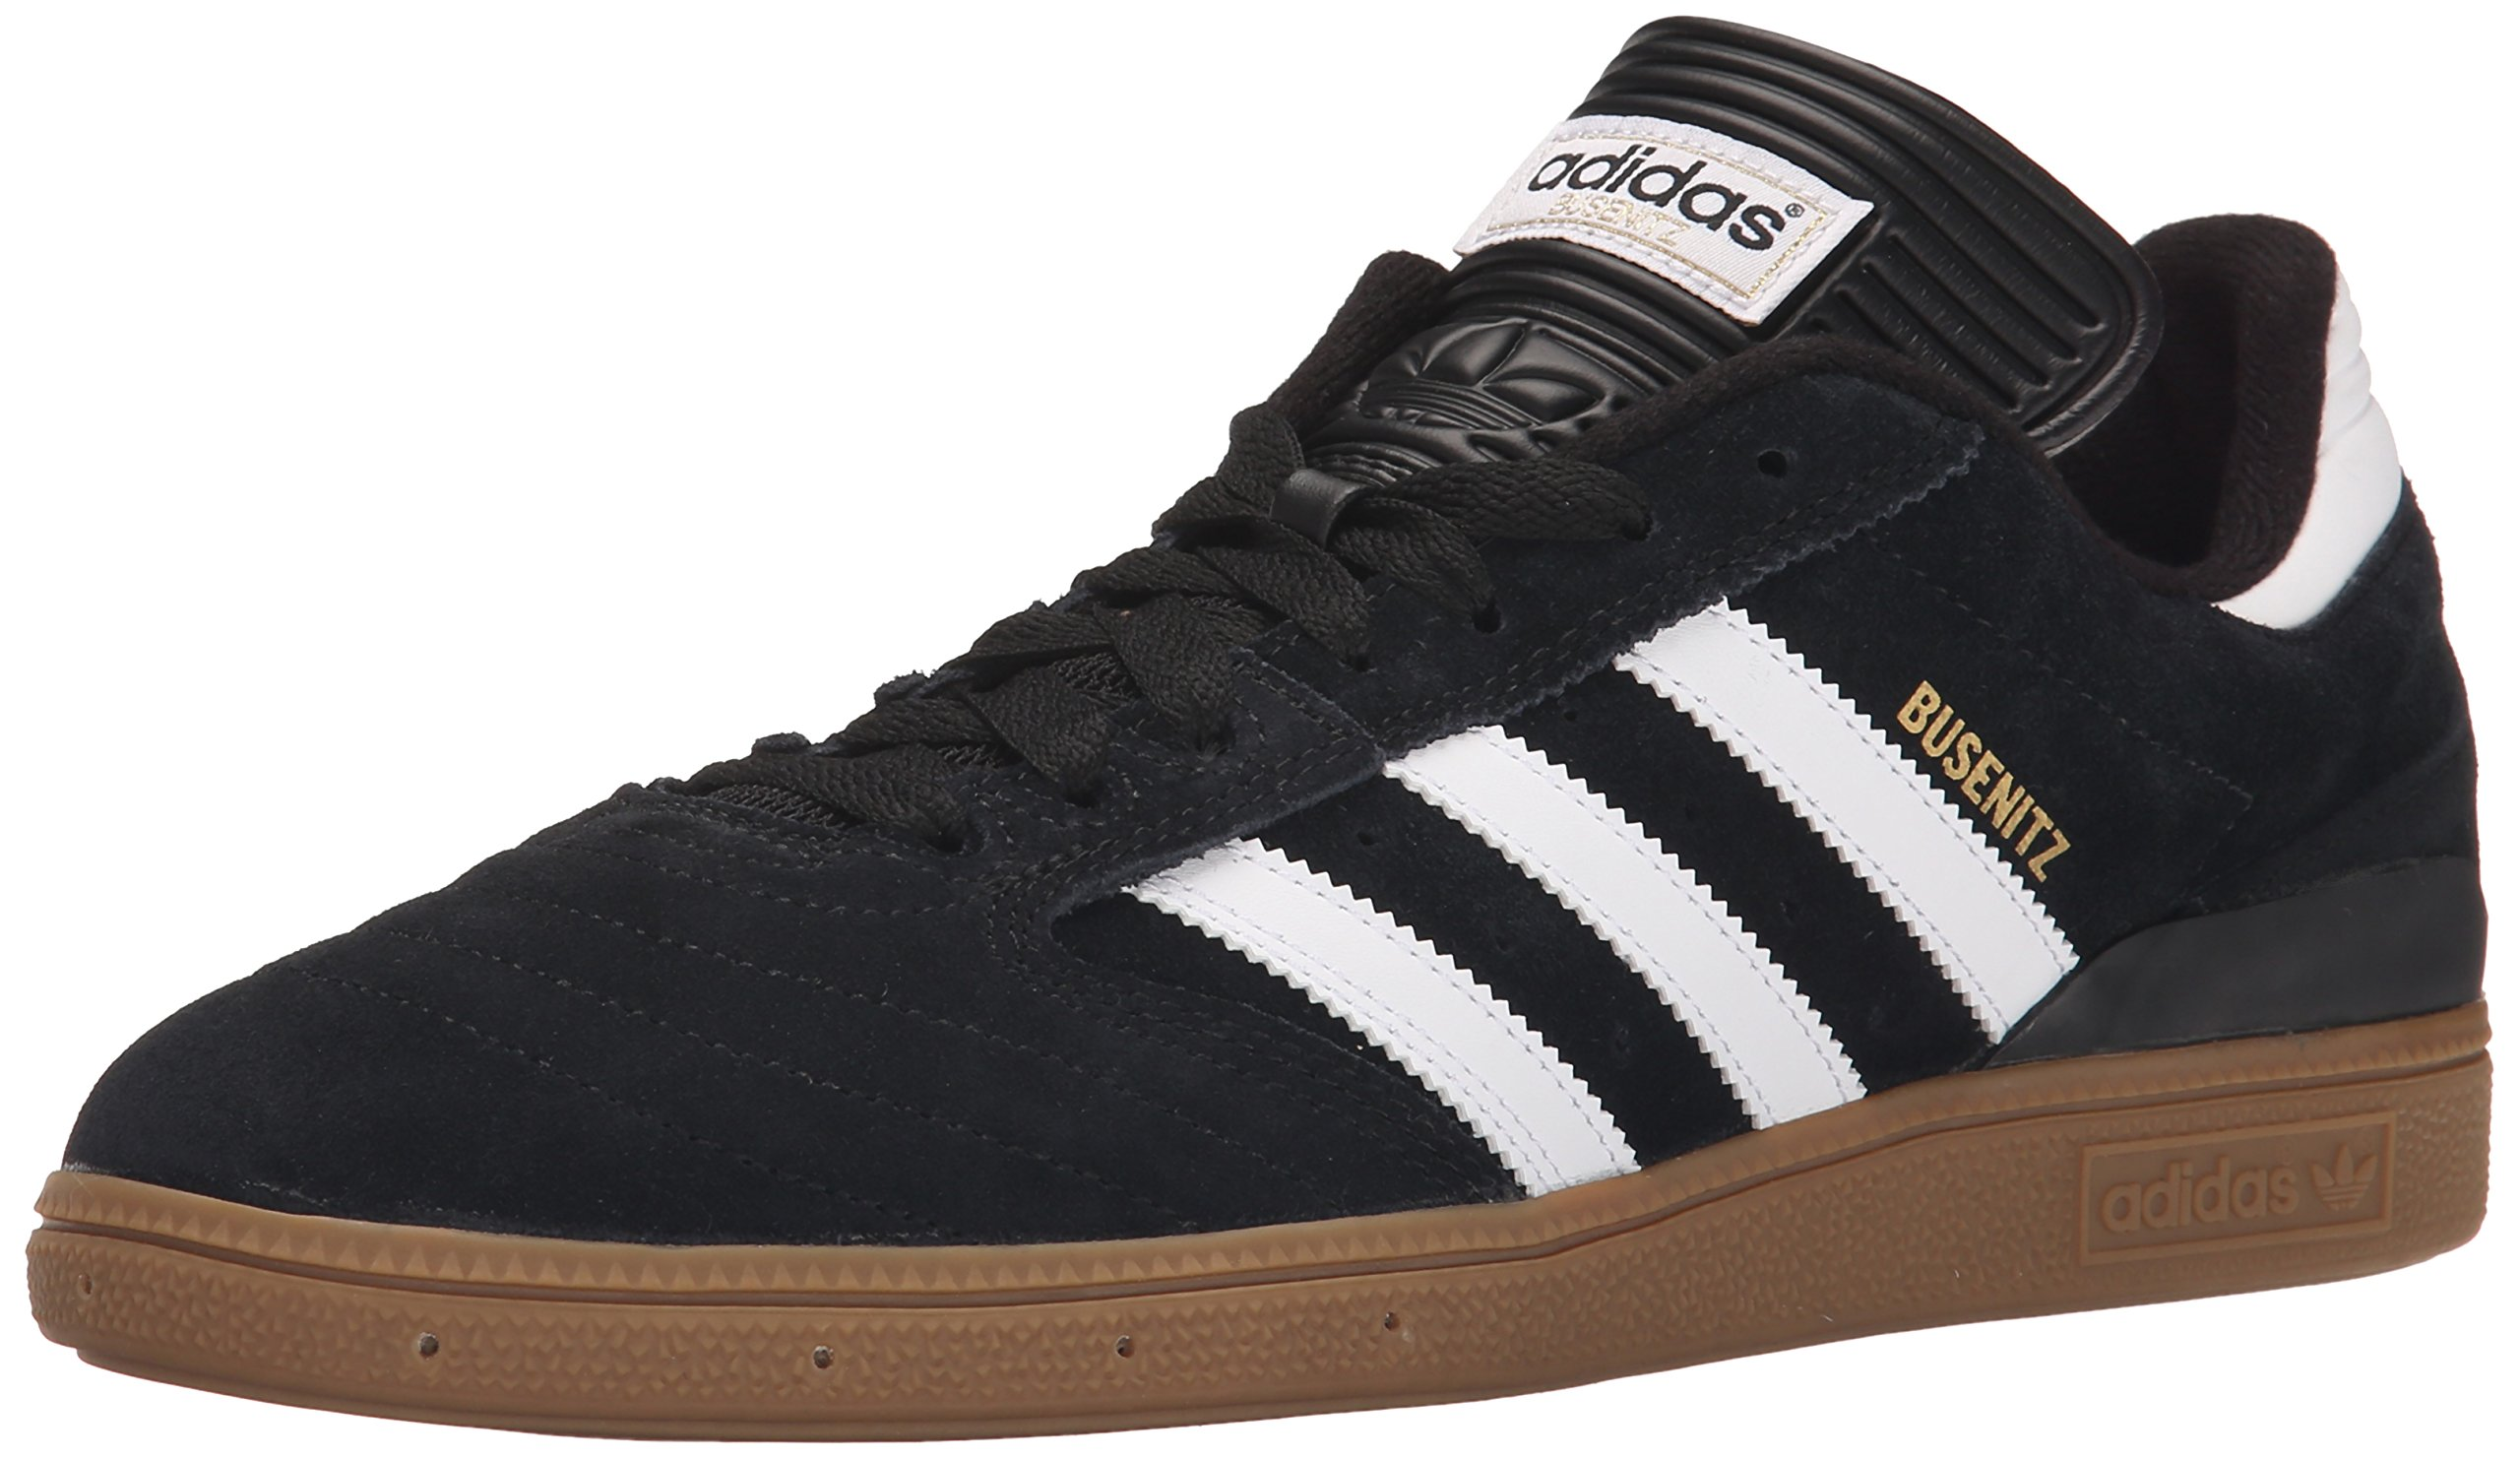 adidas Men's BUSENITZ Shoe, core black, ftwr white, gold met, 10.5 M US